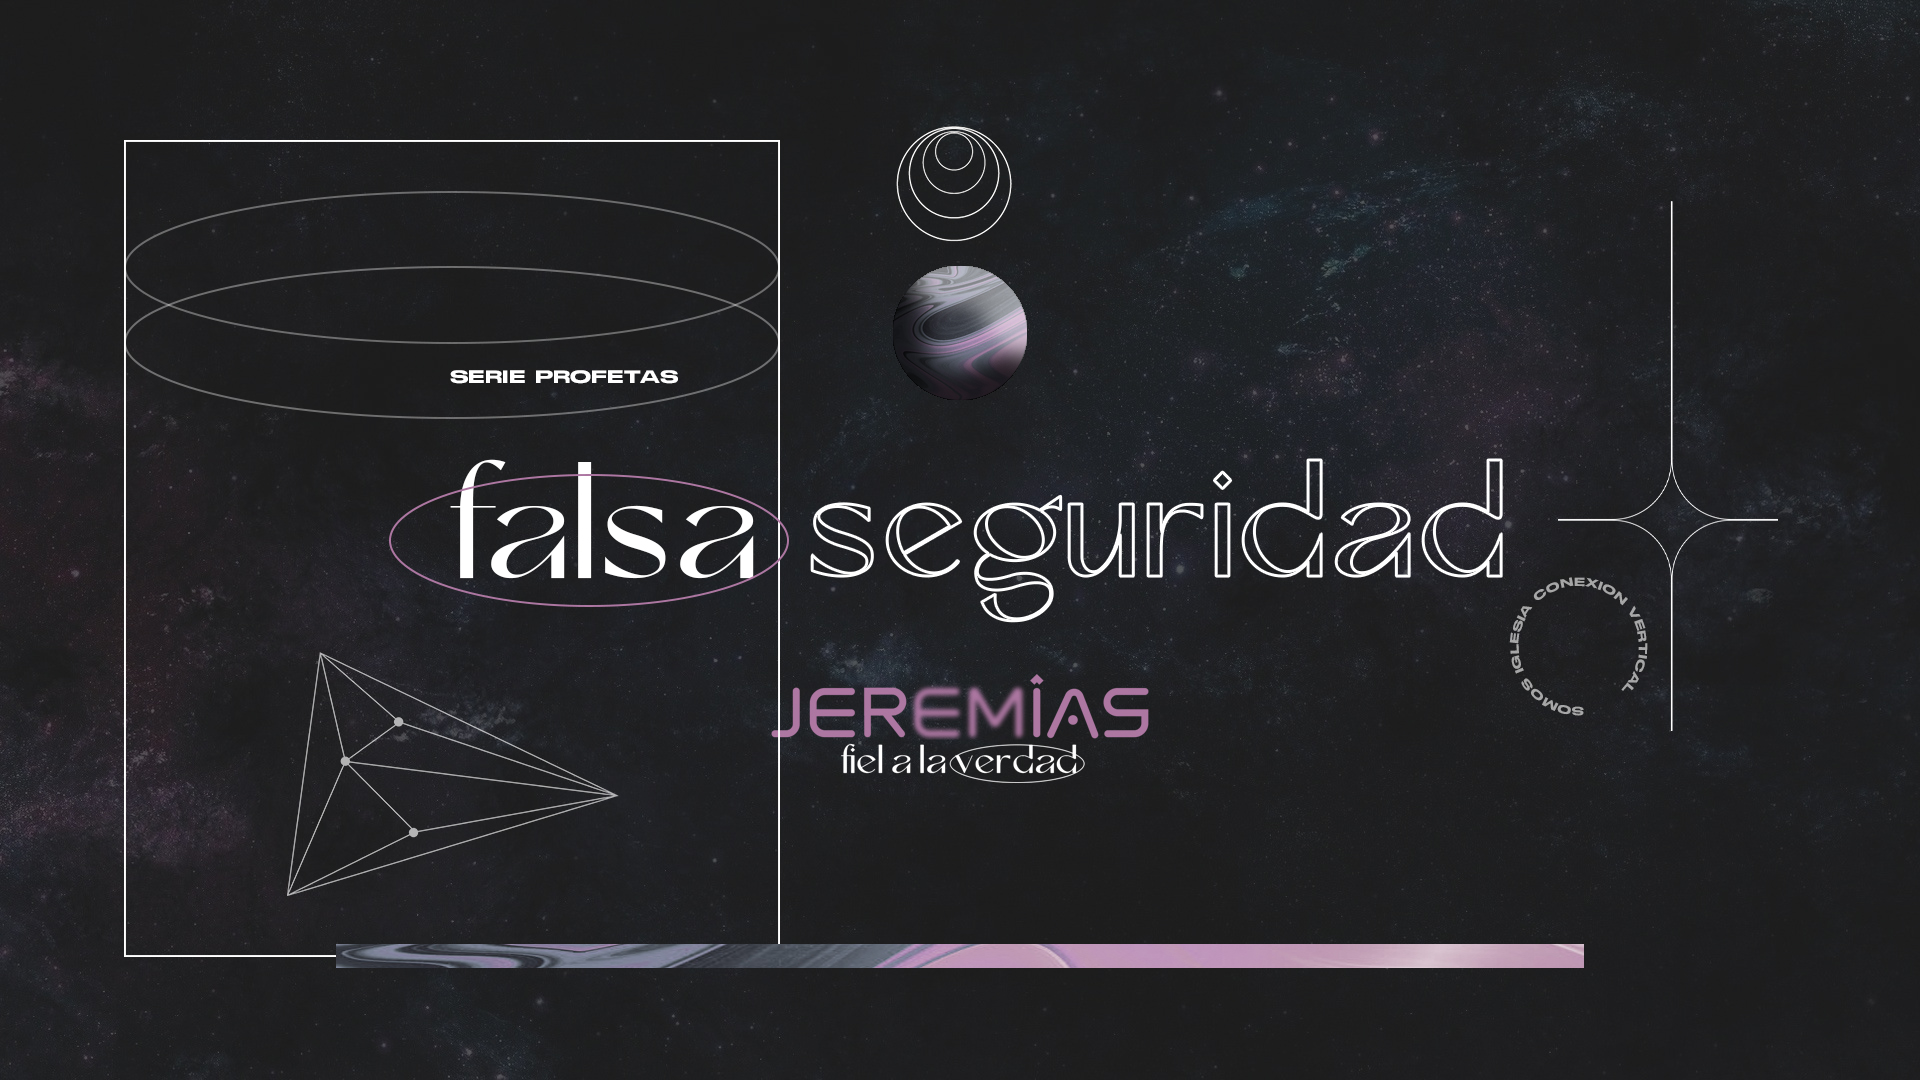 Jeremías: Falsa Seguridad